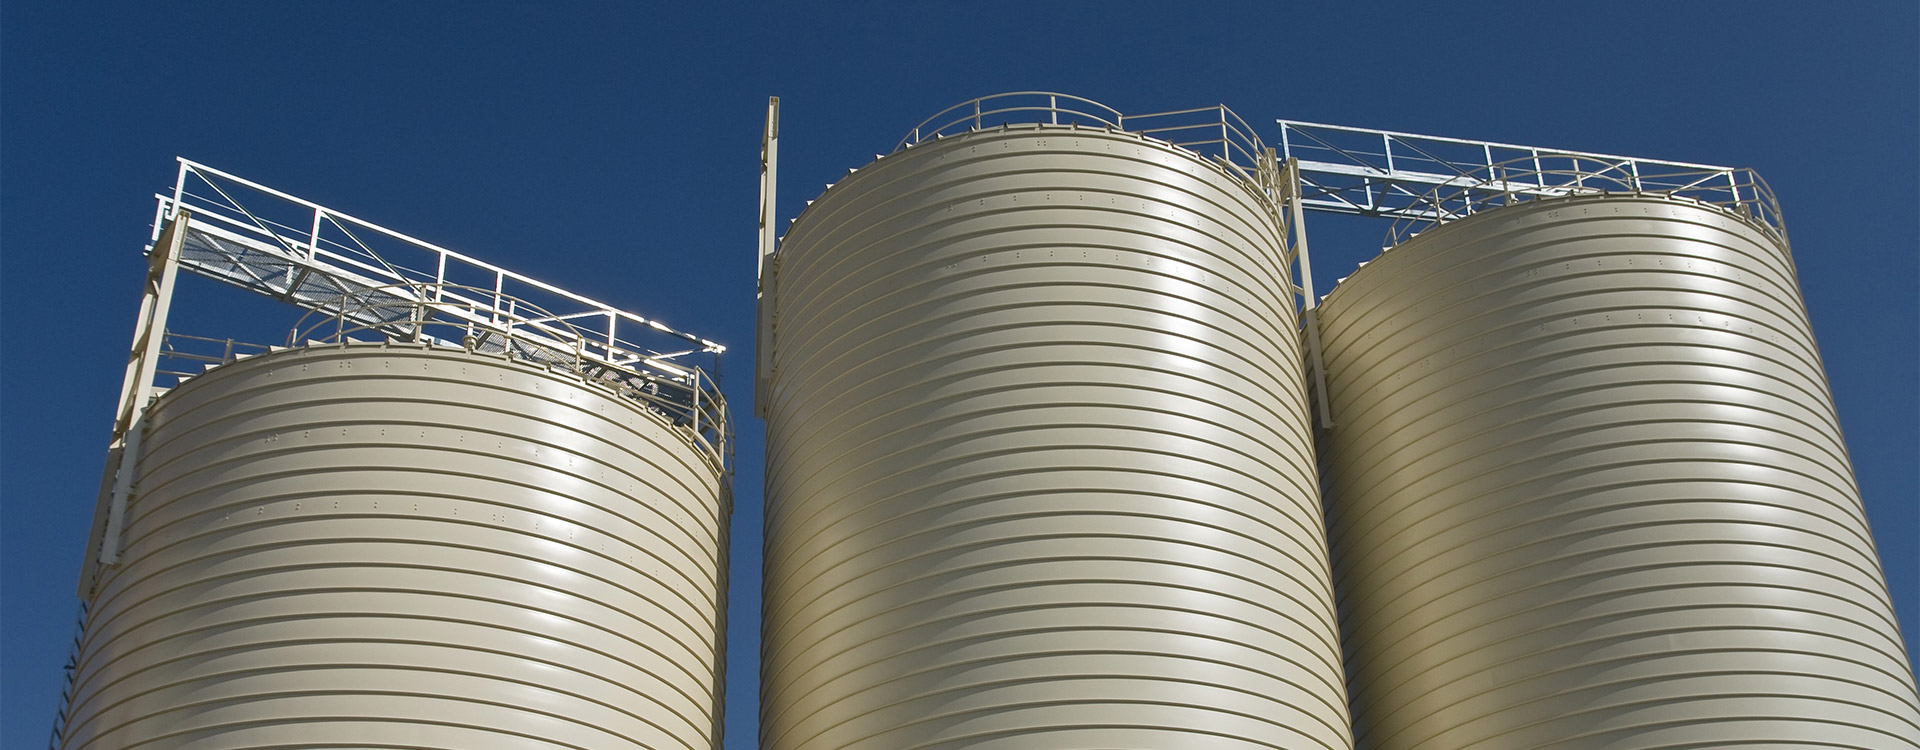 Lipp Grain Silo